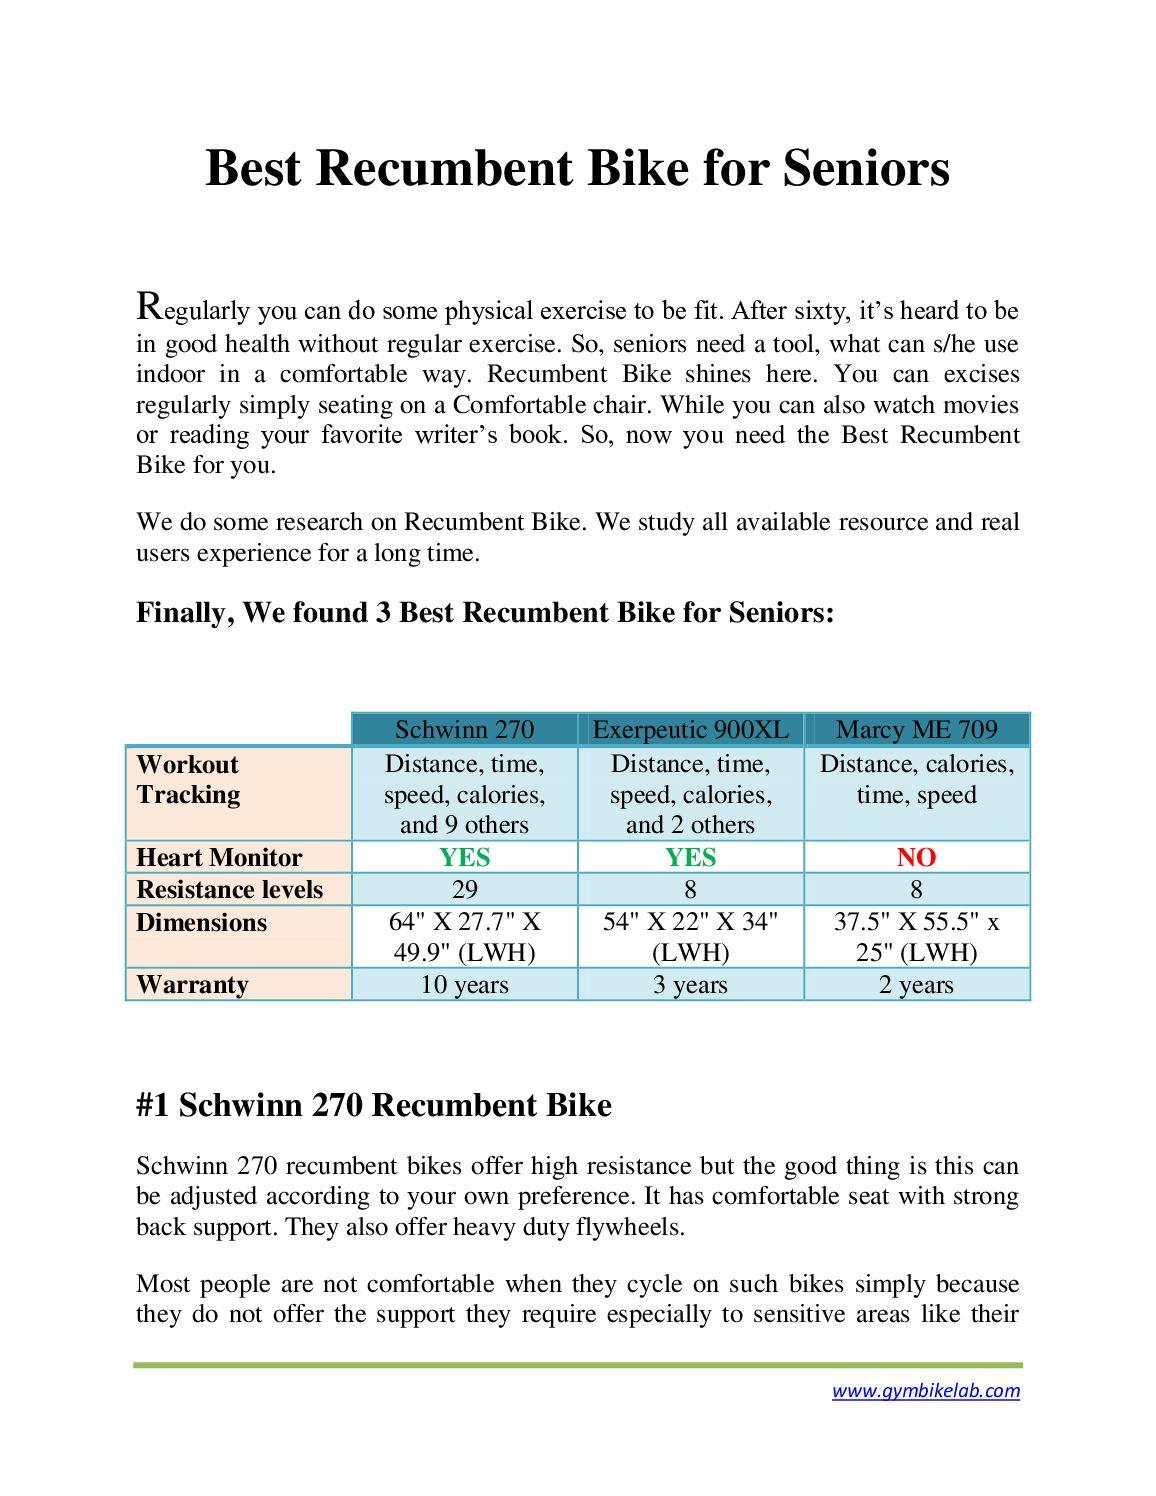 Calaméo - Best Recumbent Bike For Seniors Published